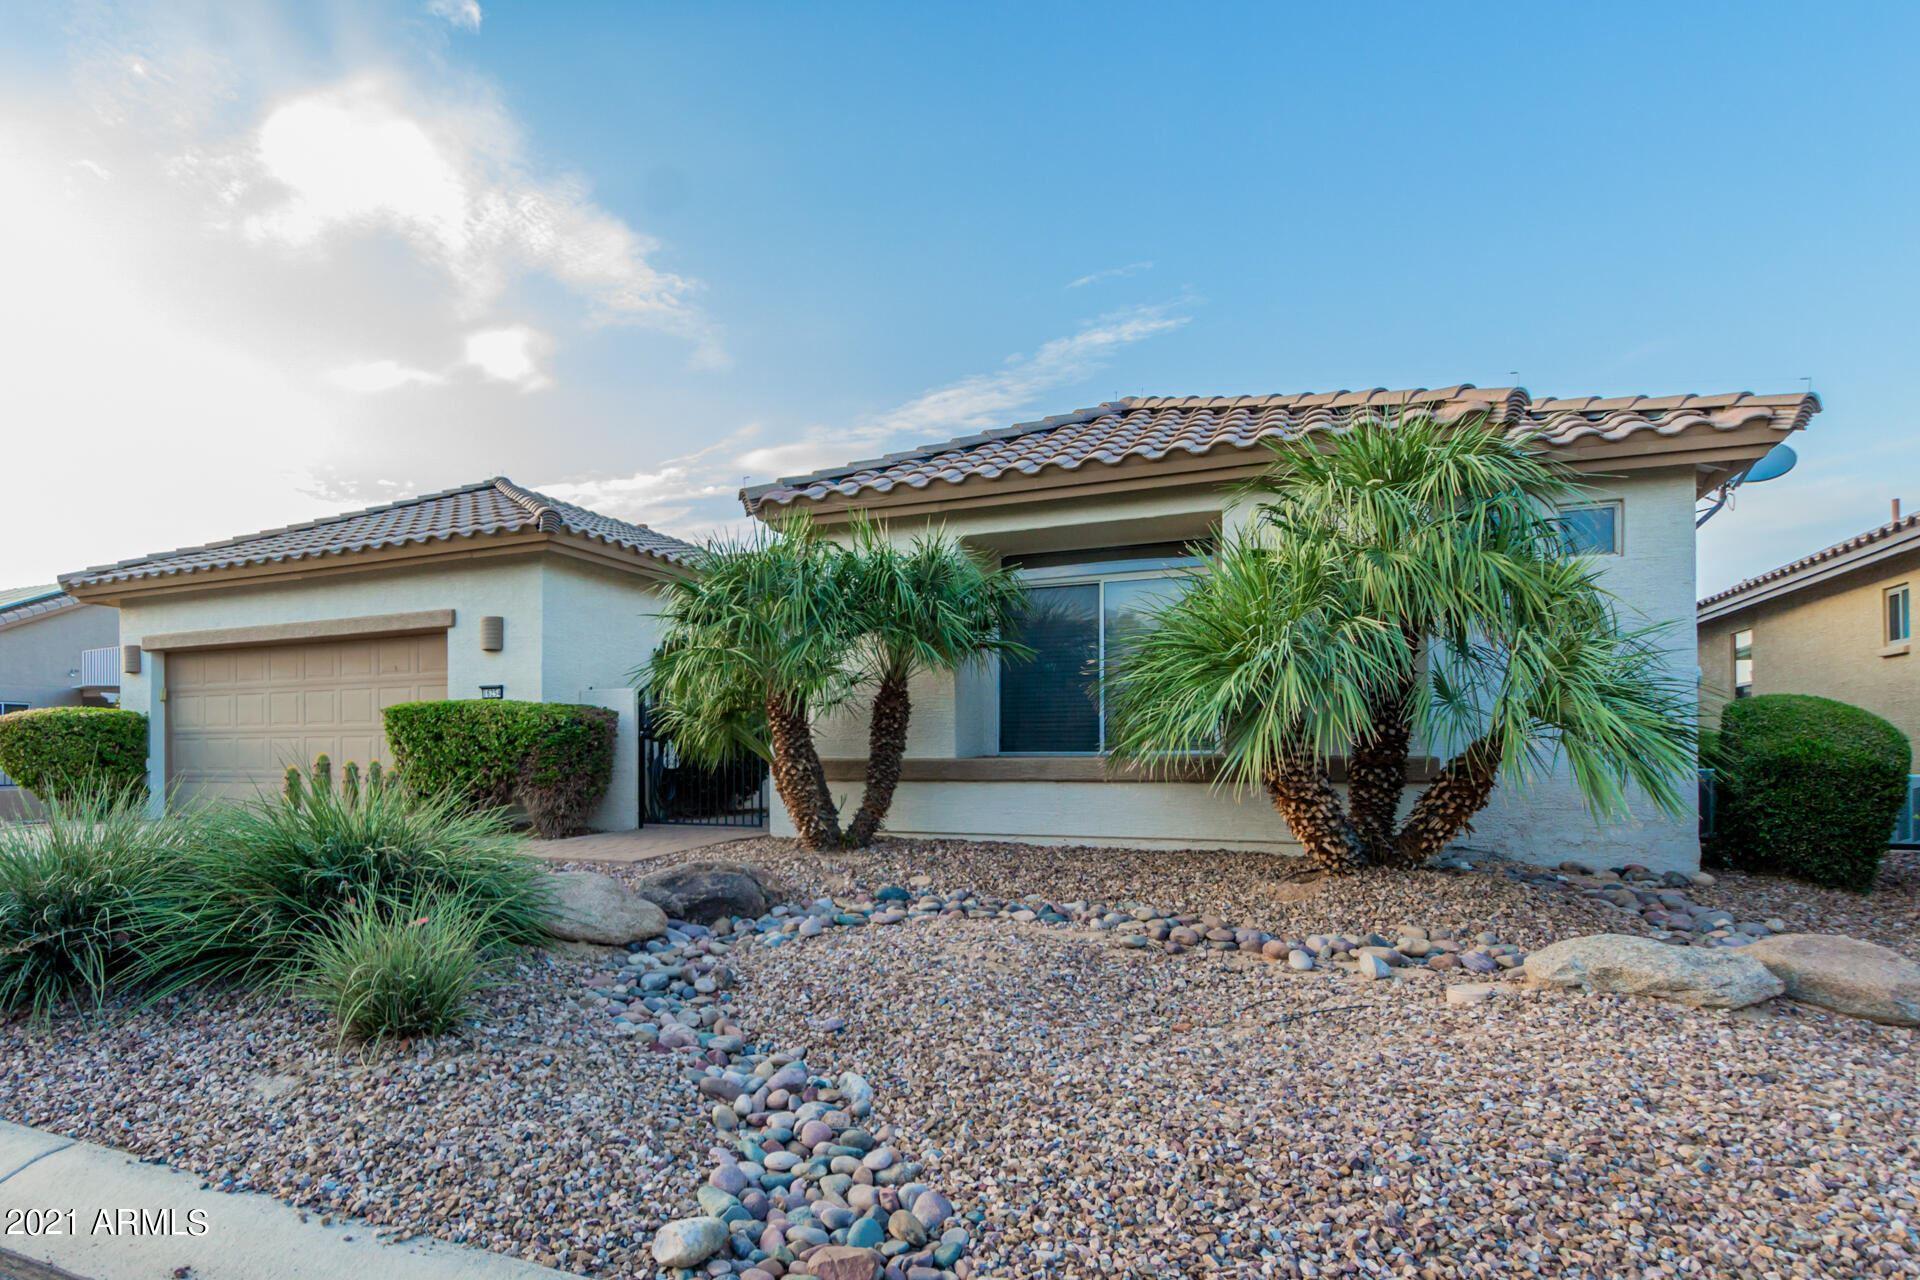 Photo of 16254 W INDIANOLA Avenue, Goodyear, AZ 85395 (MLS # 6295937)